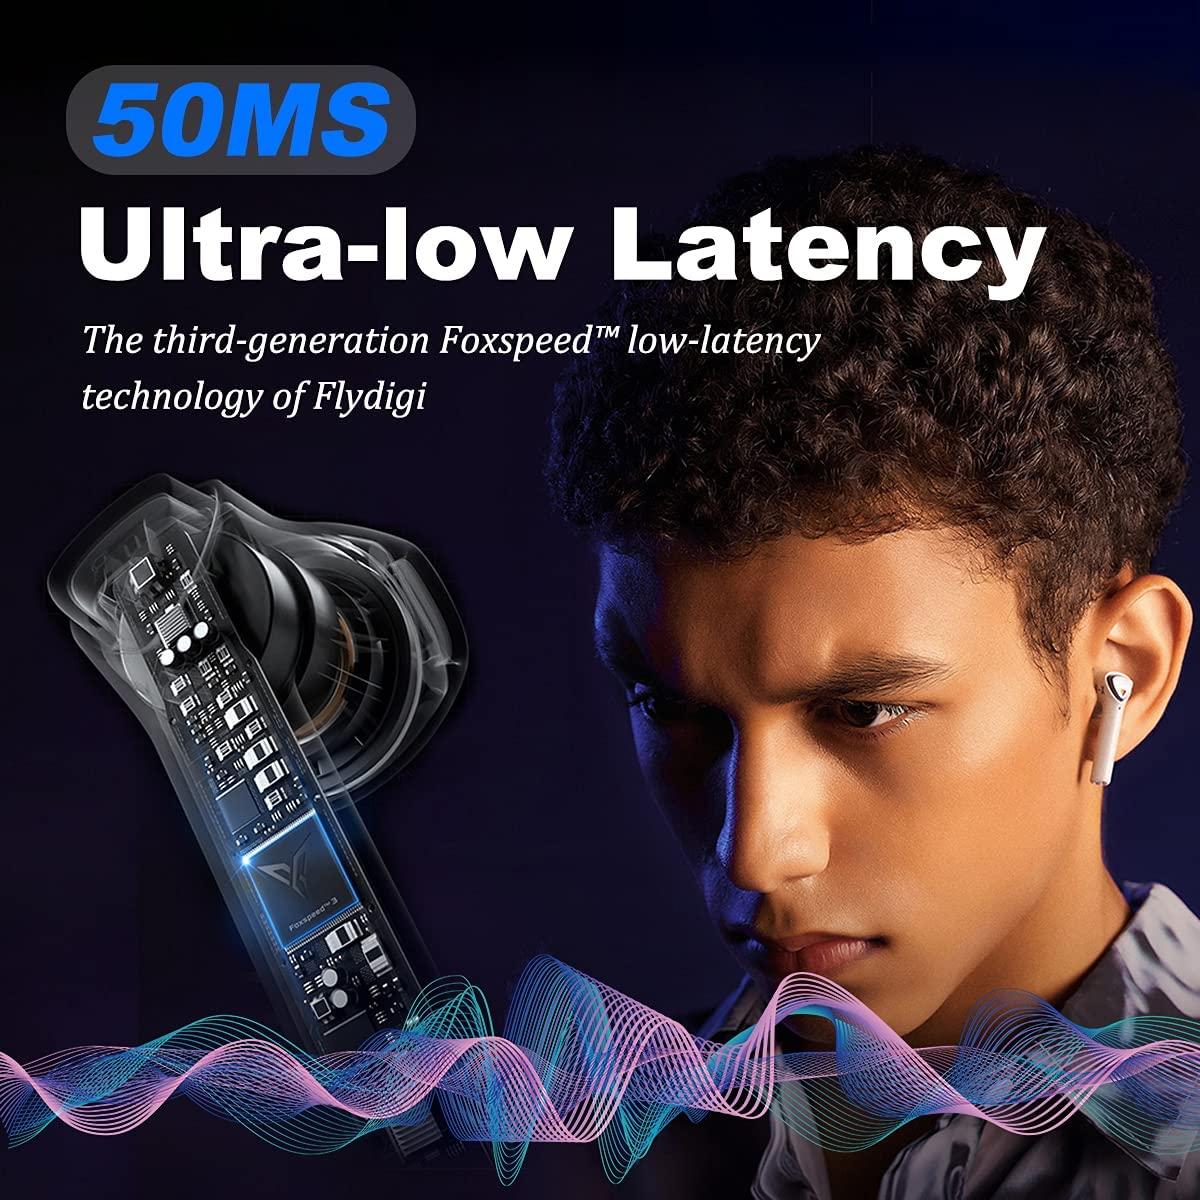 Flydigi Cyberfox X1 Bluetooth Wireless Earbuds Noise-Canceling Headphones 50Ms Ultra-Low Latency Gaming Earbuds, 13.4Mm Drivers enlarge